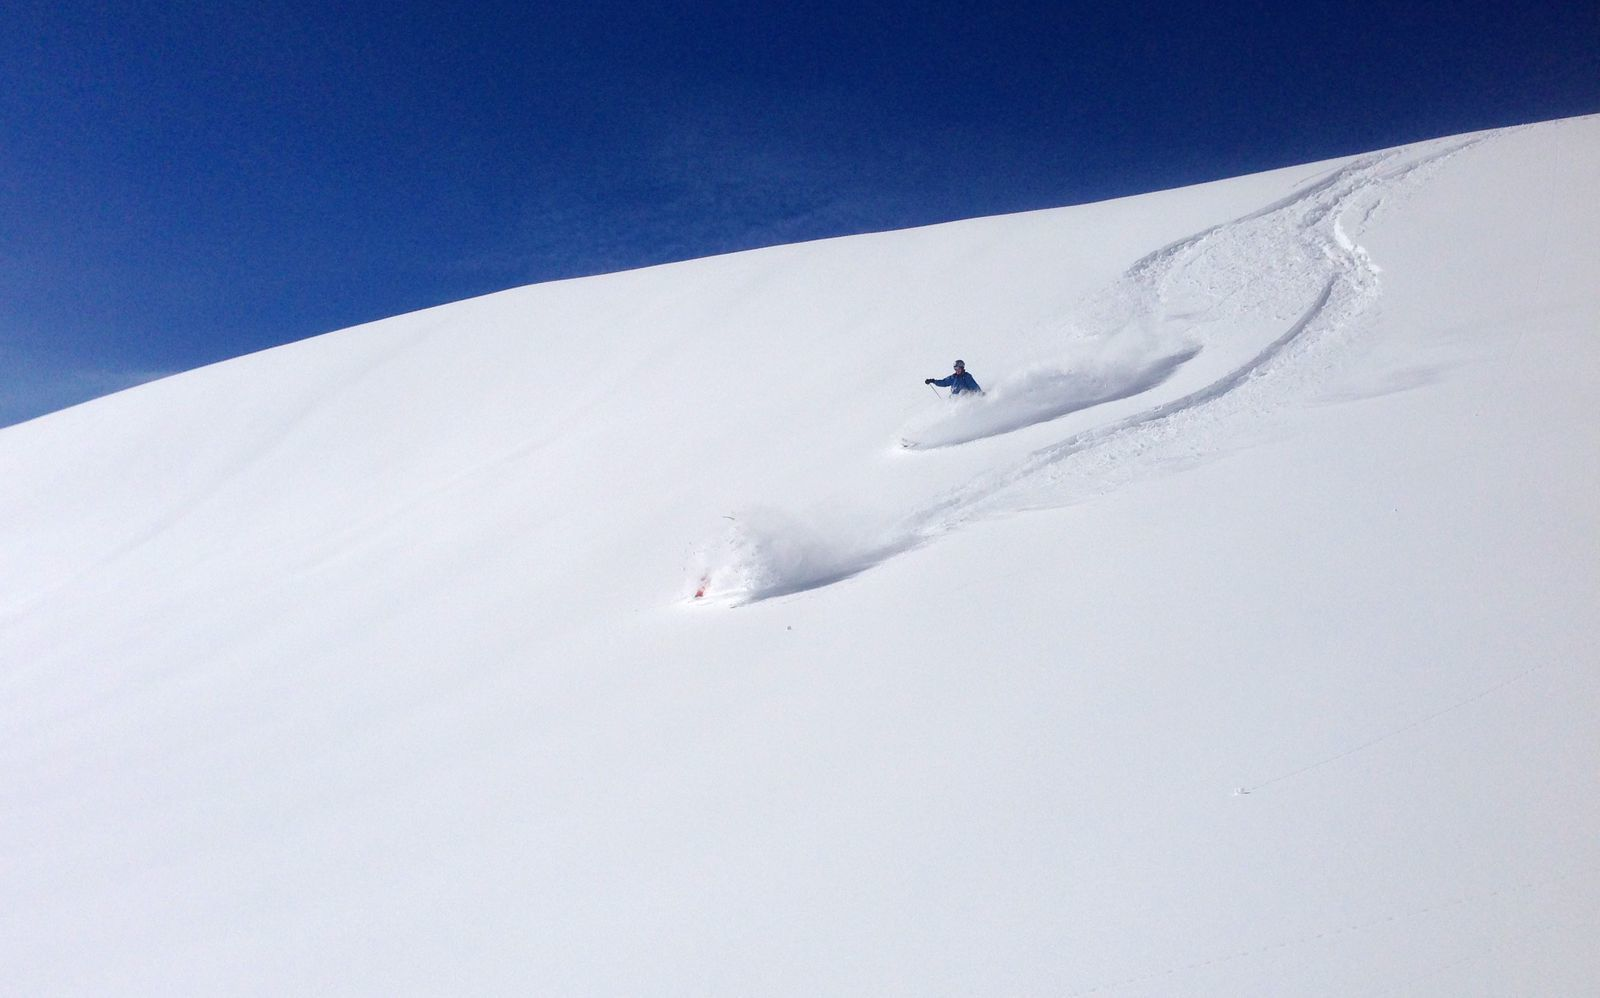 http://www.geromegualaguidechamonix.com à Chamonix Mont-Blanc